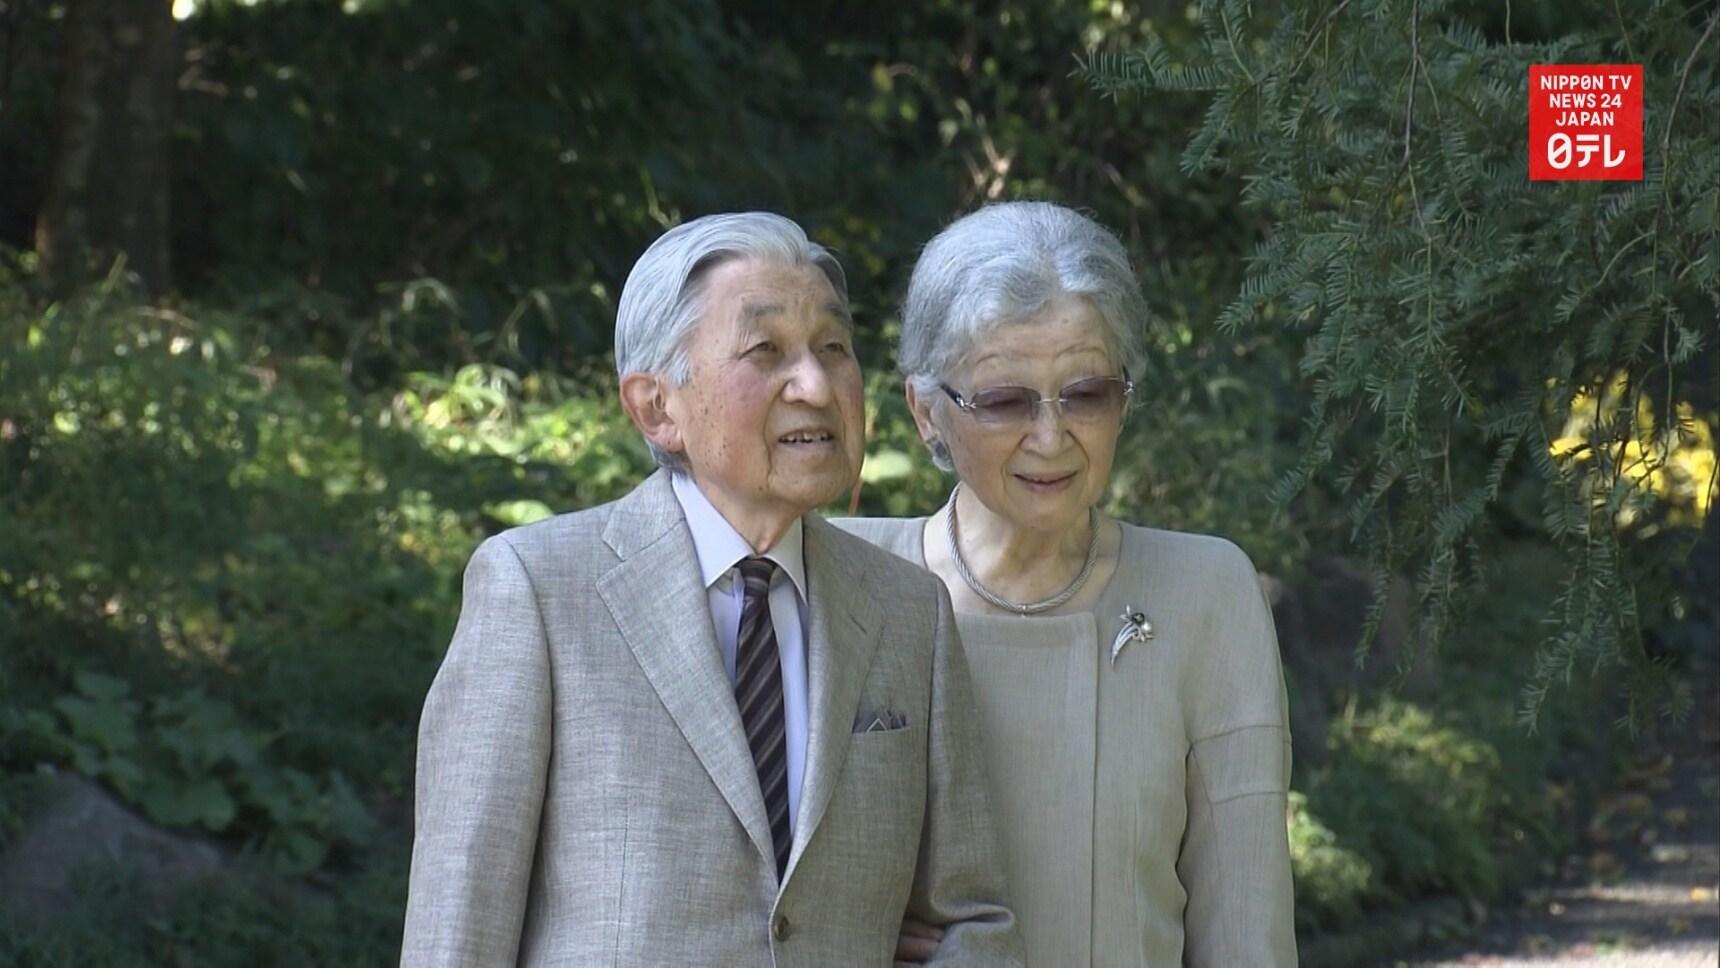 Former Emperor Akihito Turns 86